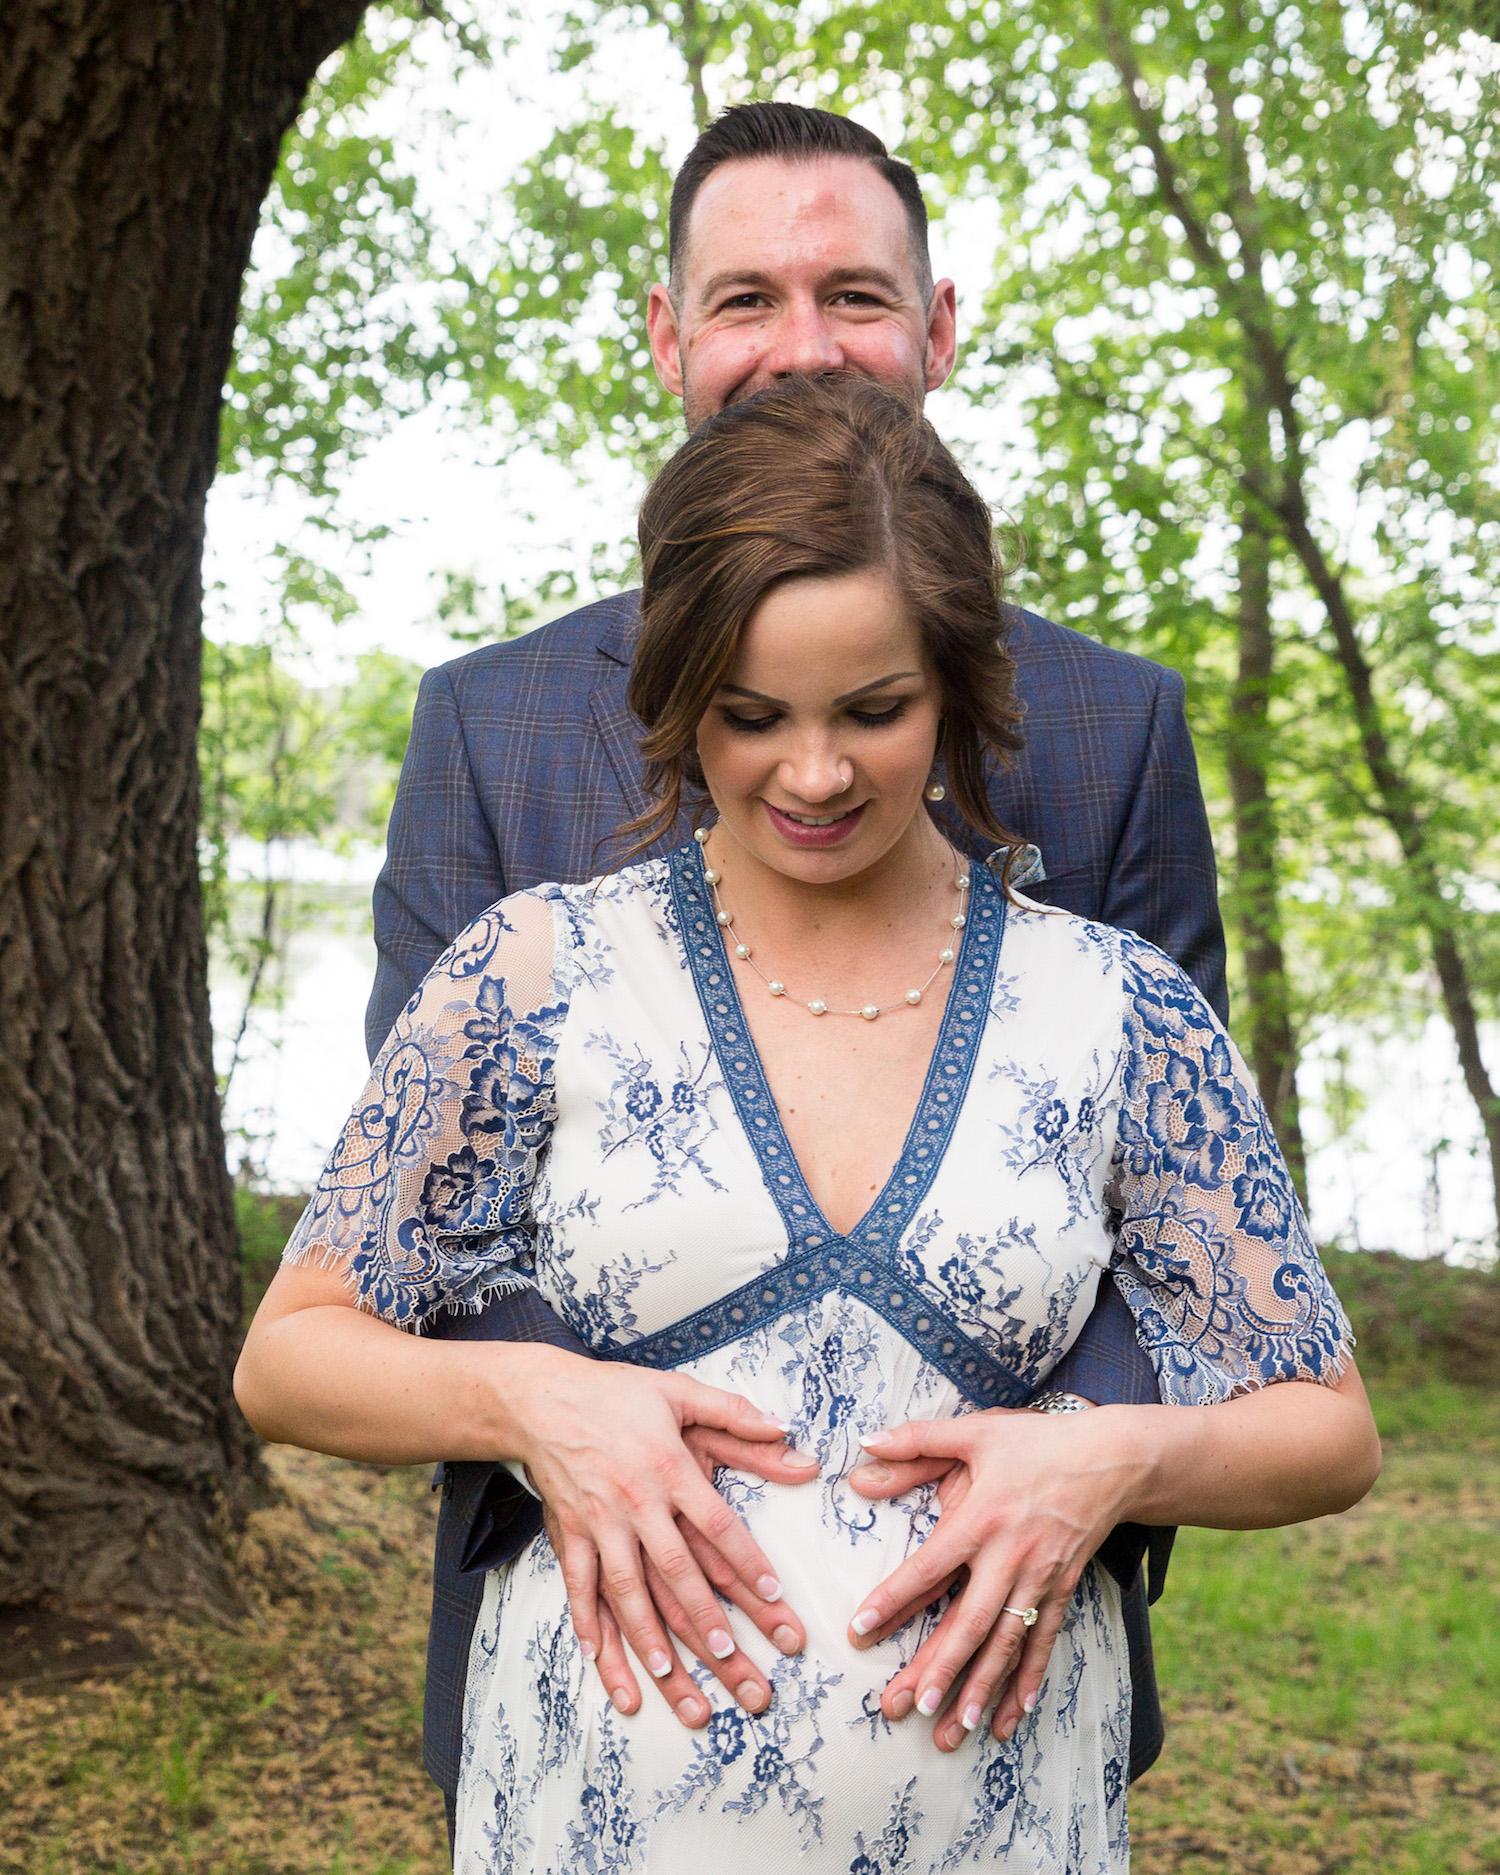 Cindyrella's Garden, pregnant bride in blue and white lace wedding dress, pregnancy photo